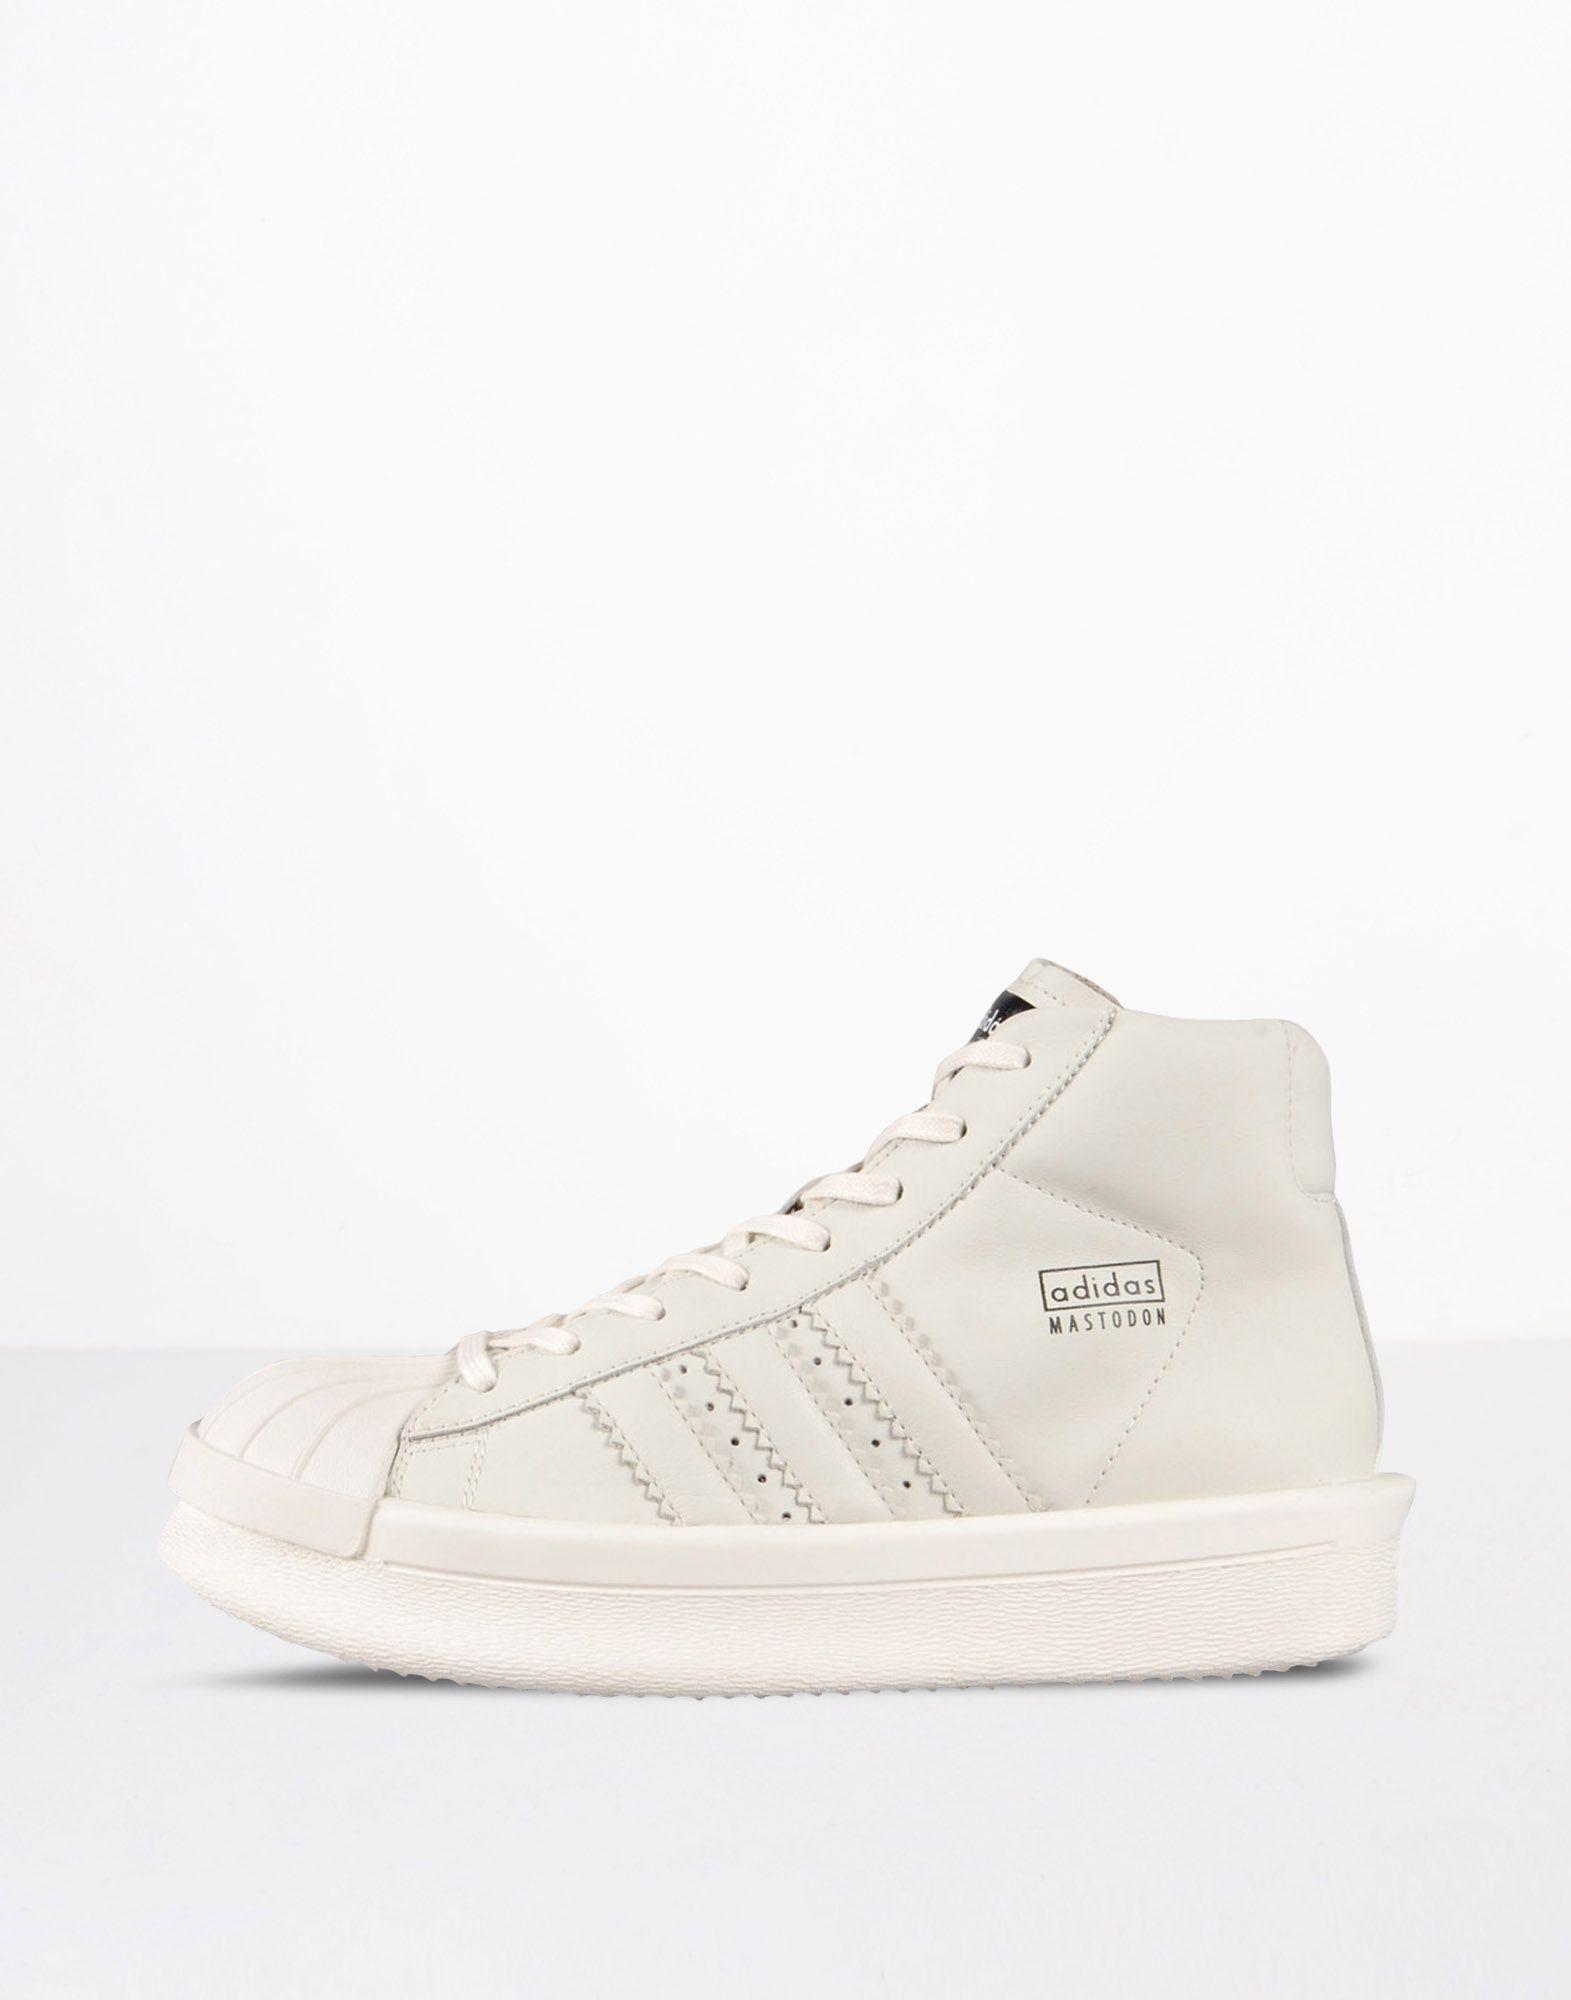 adidas Mastodon Pro sneakers UAktBDT